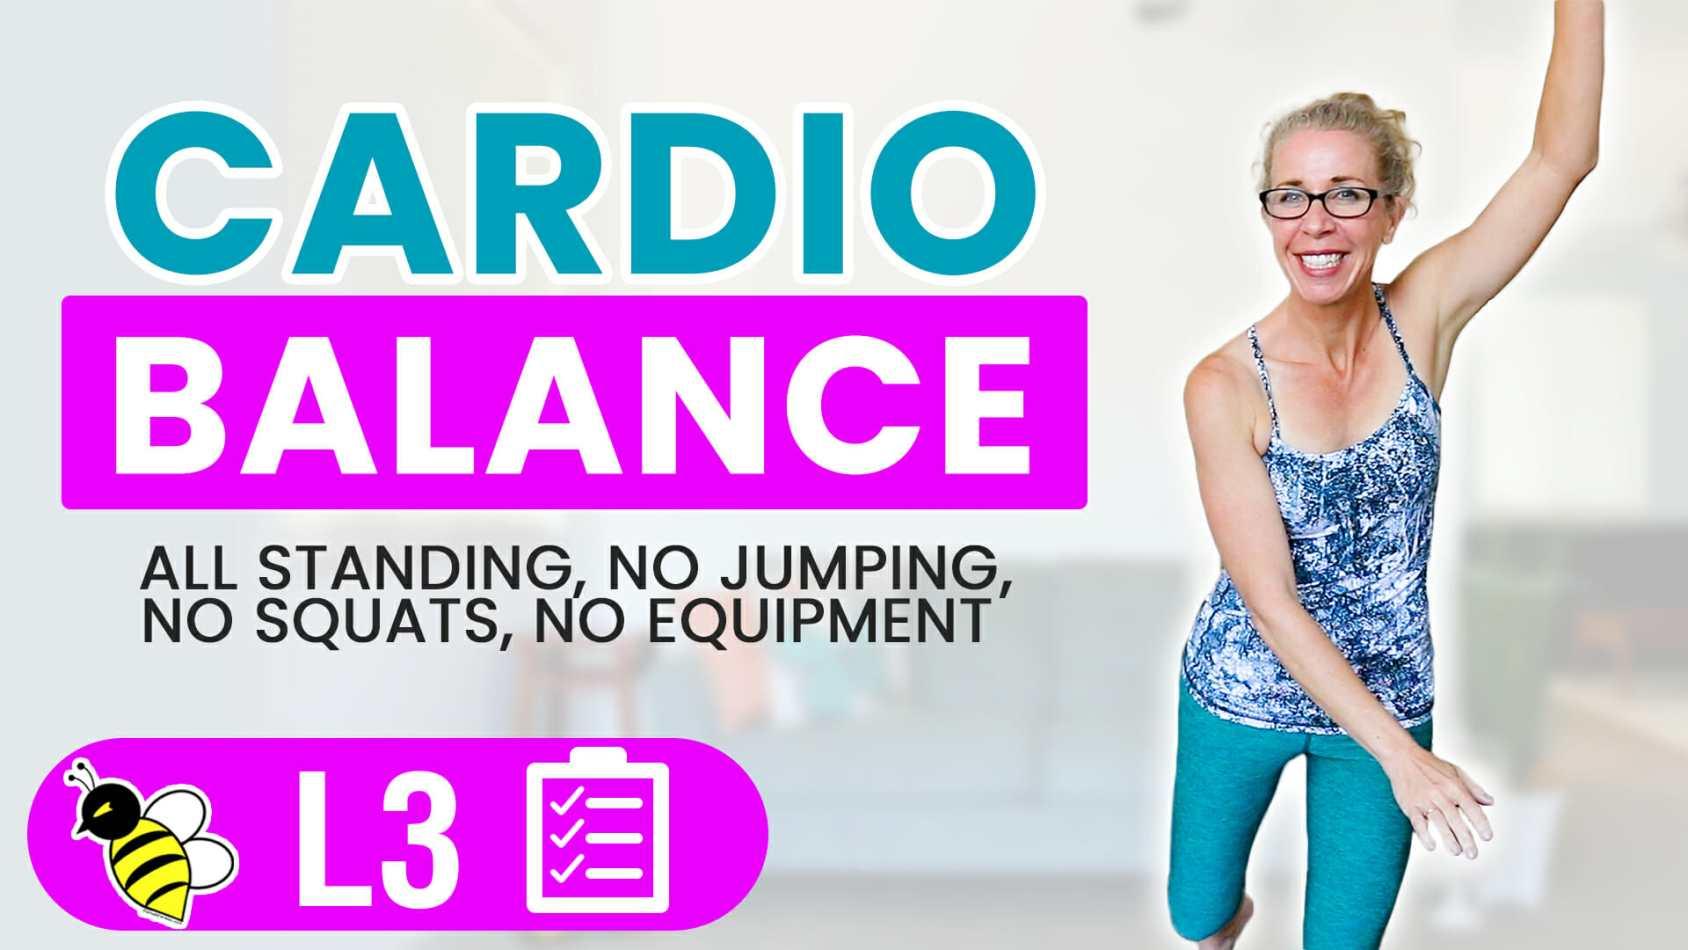 30 Minute Low Impact Cardio Balance, Functional Training for Women